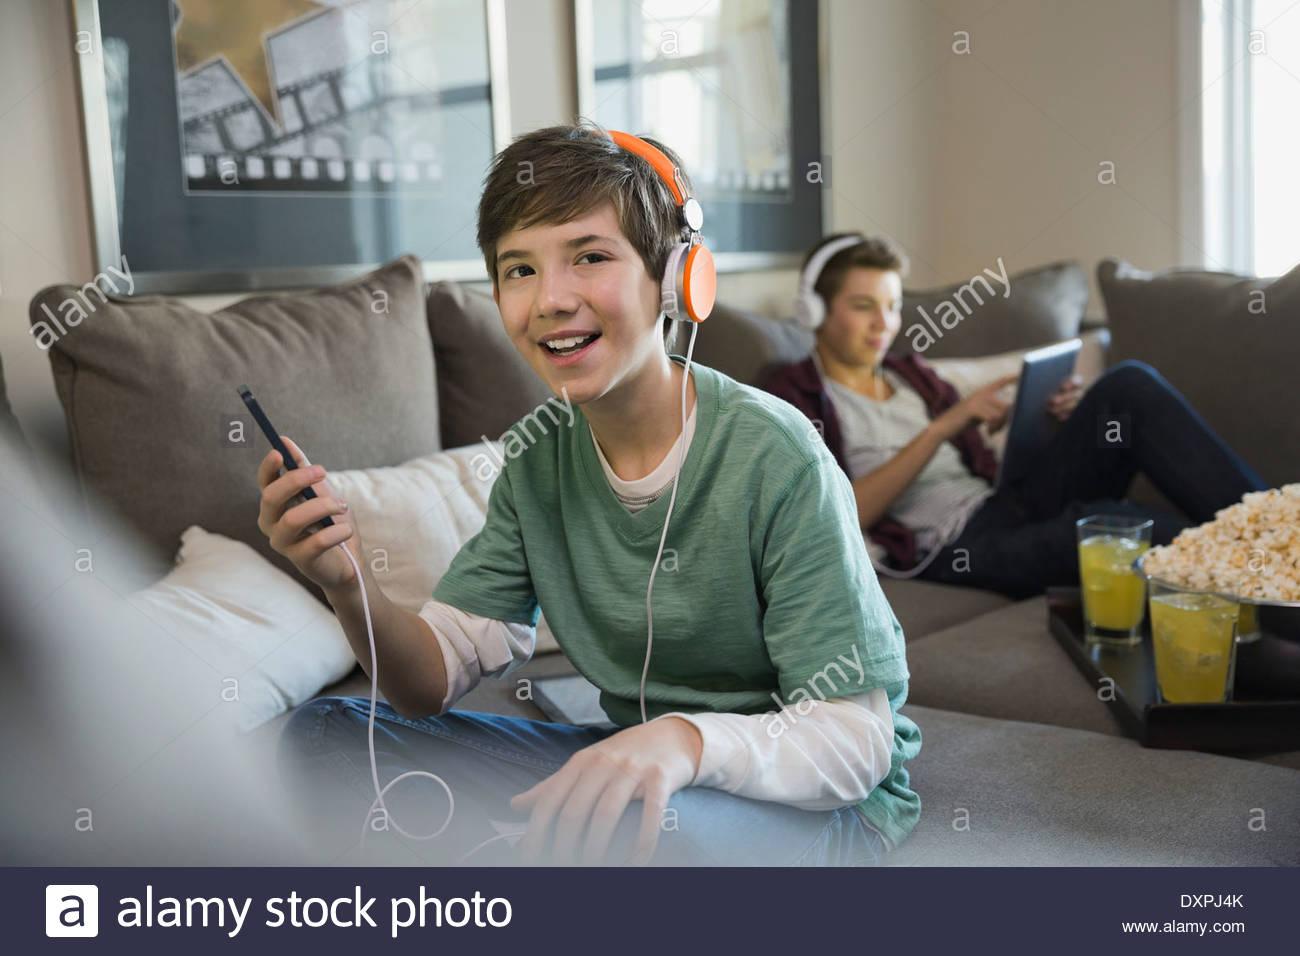 Junge Musik hören auf Smartphone Stockbild